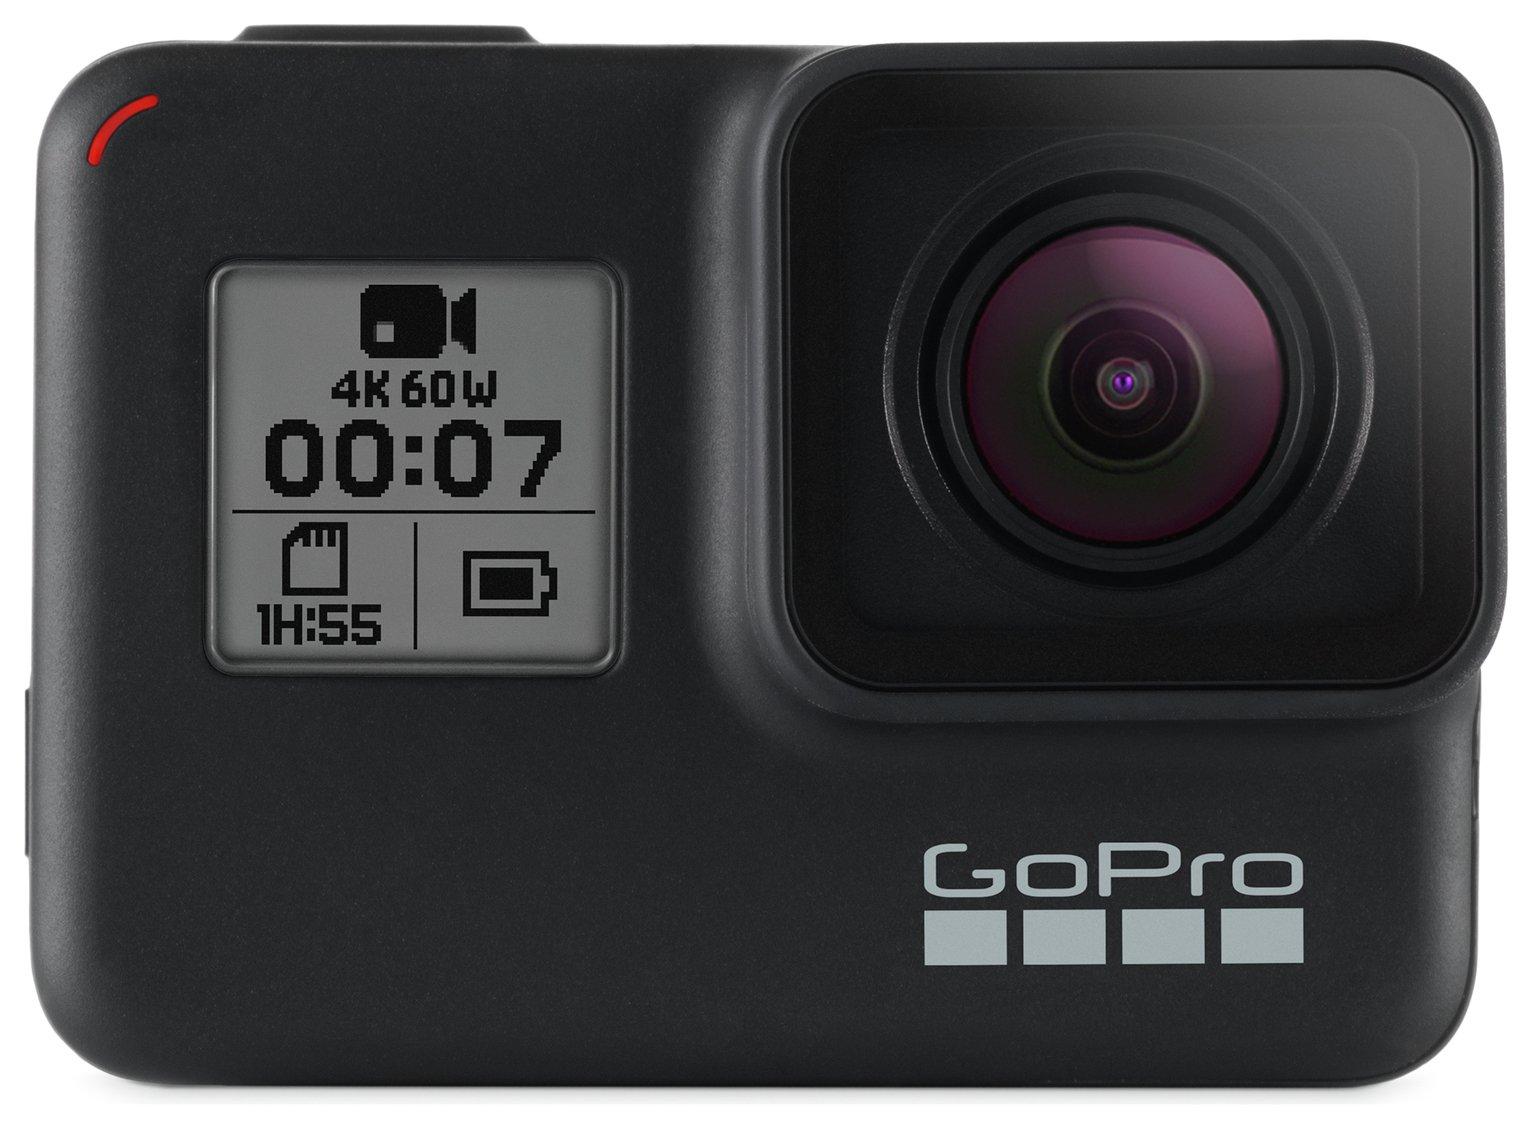 GoPro HERO7 Black CHDHX-701-RW Action Camera